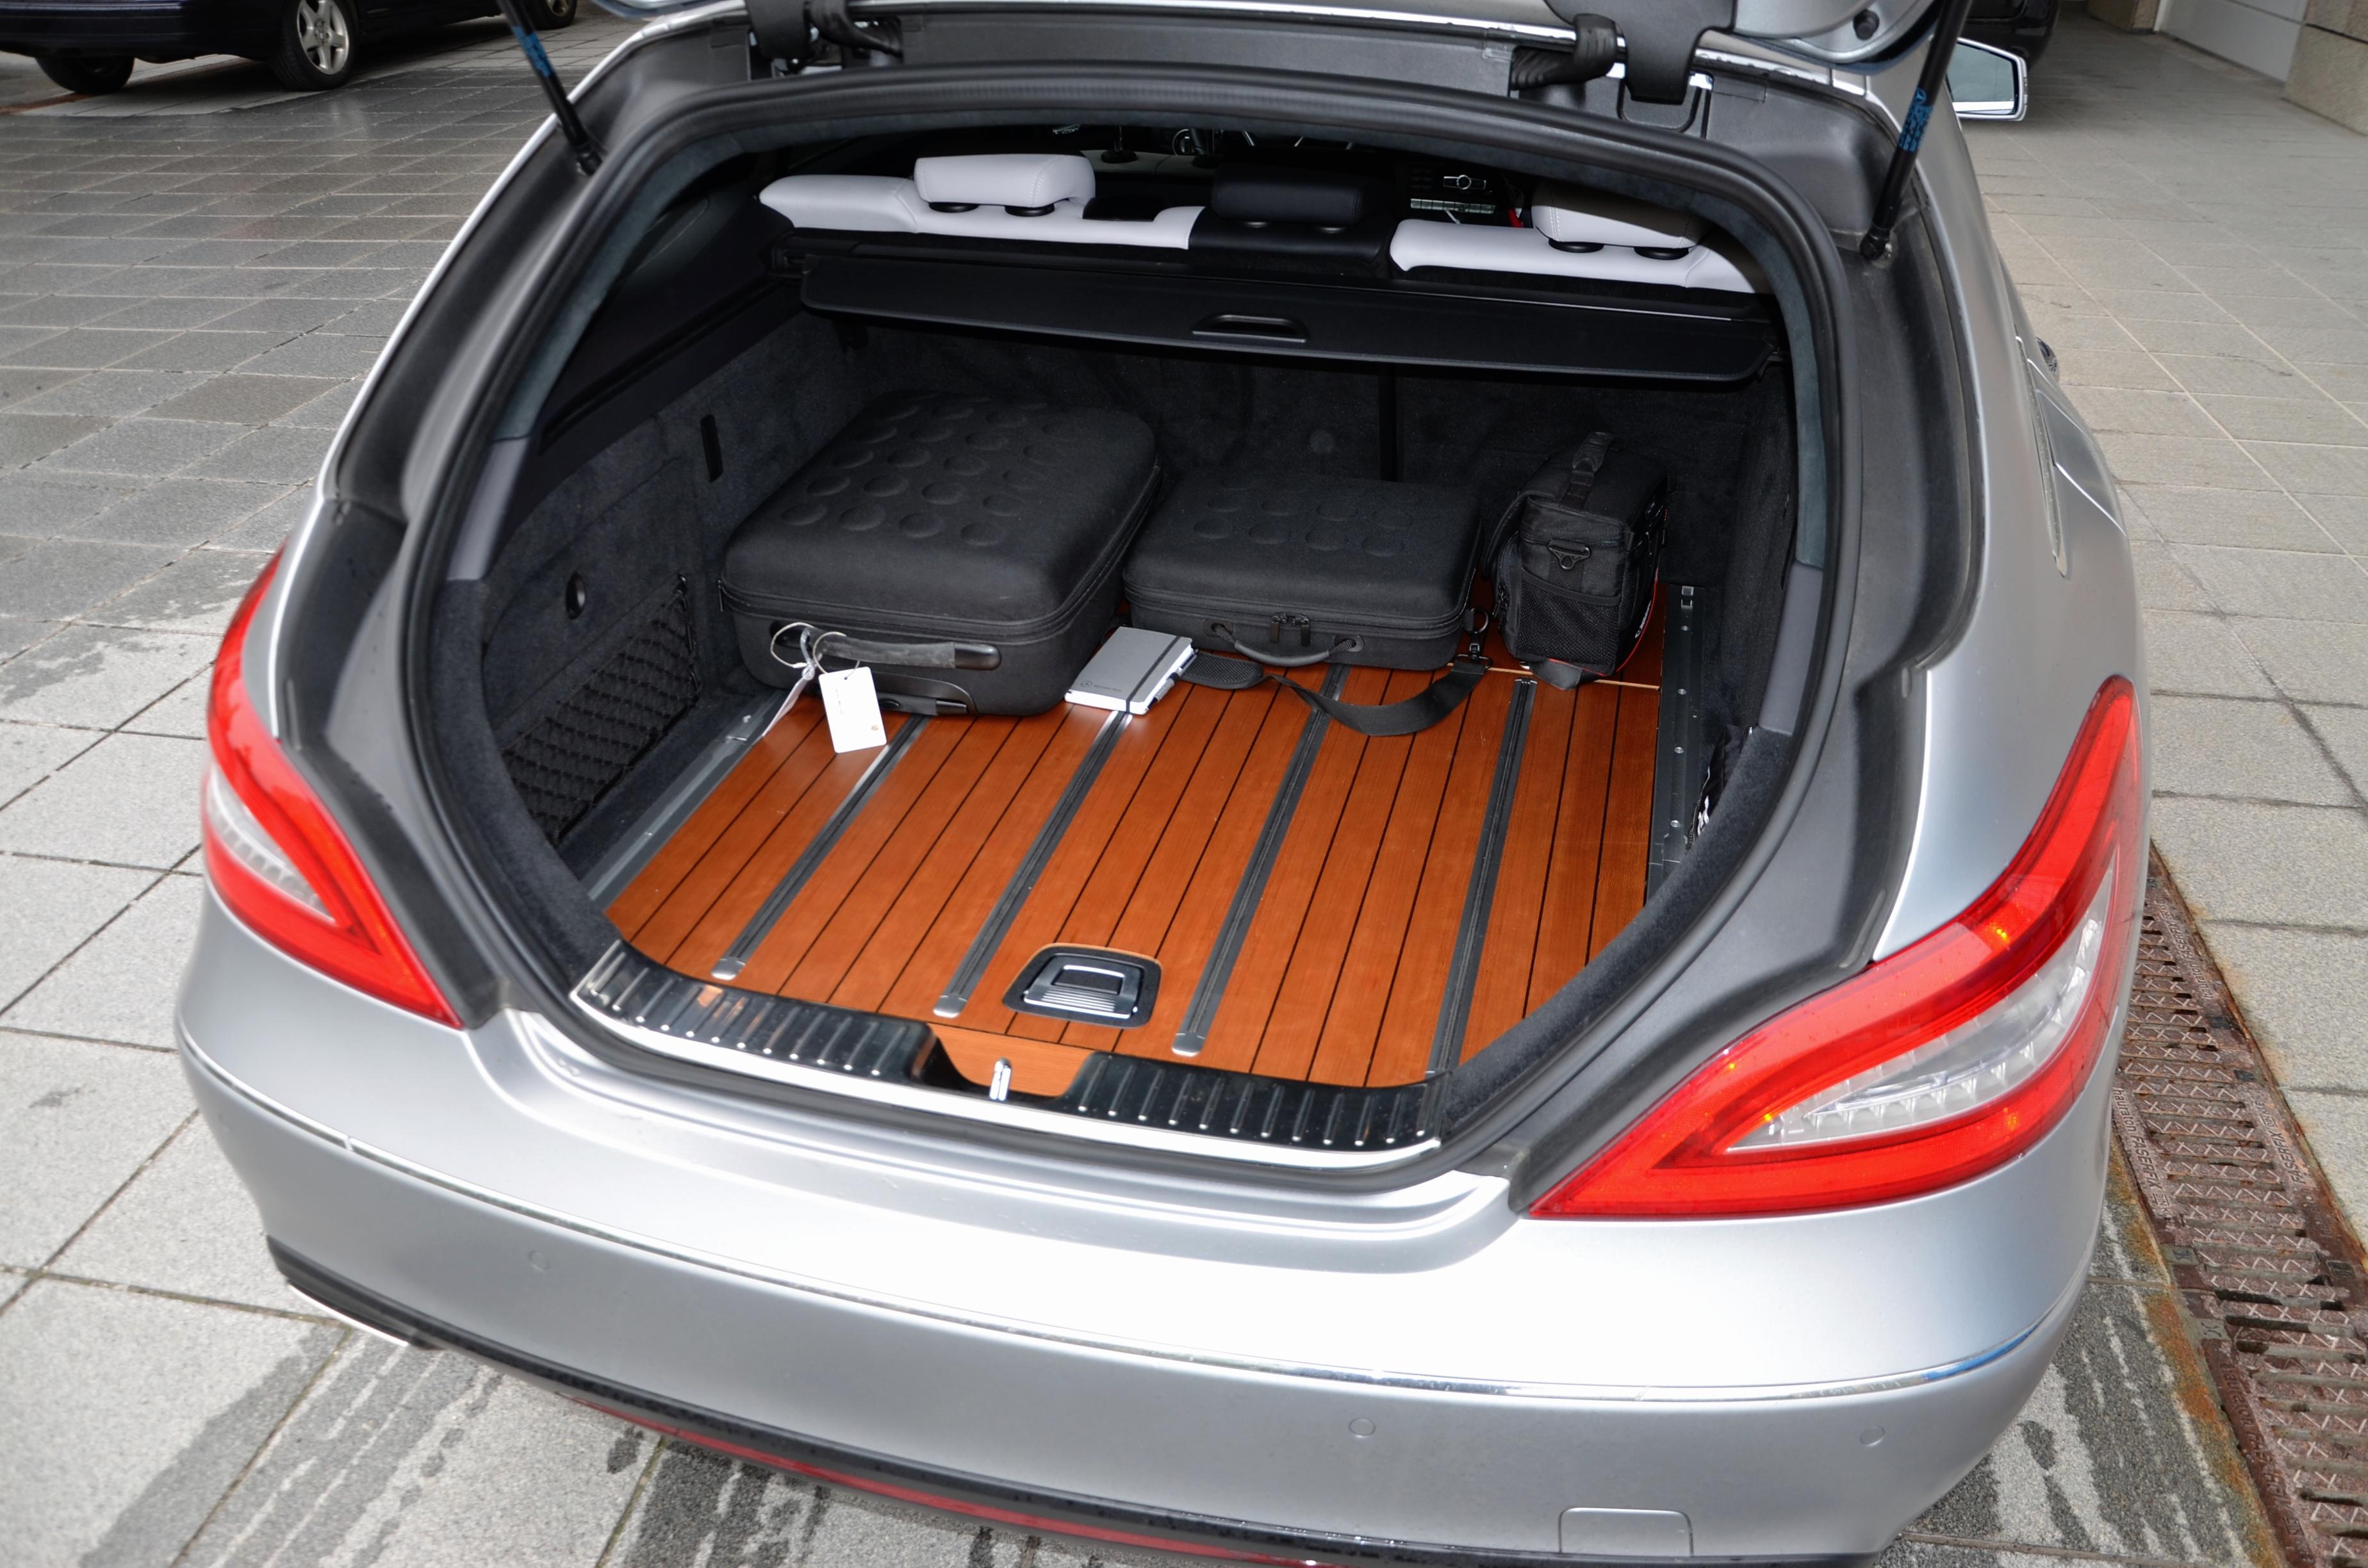 Mercedes-Benz CLS 250 CDI Shooting Brake Holzboden